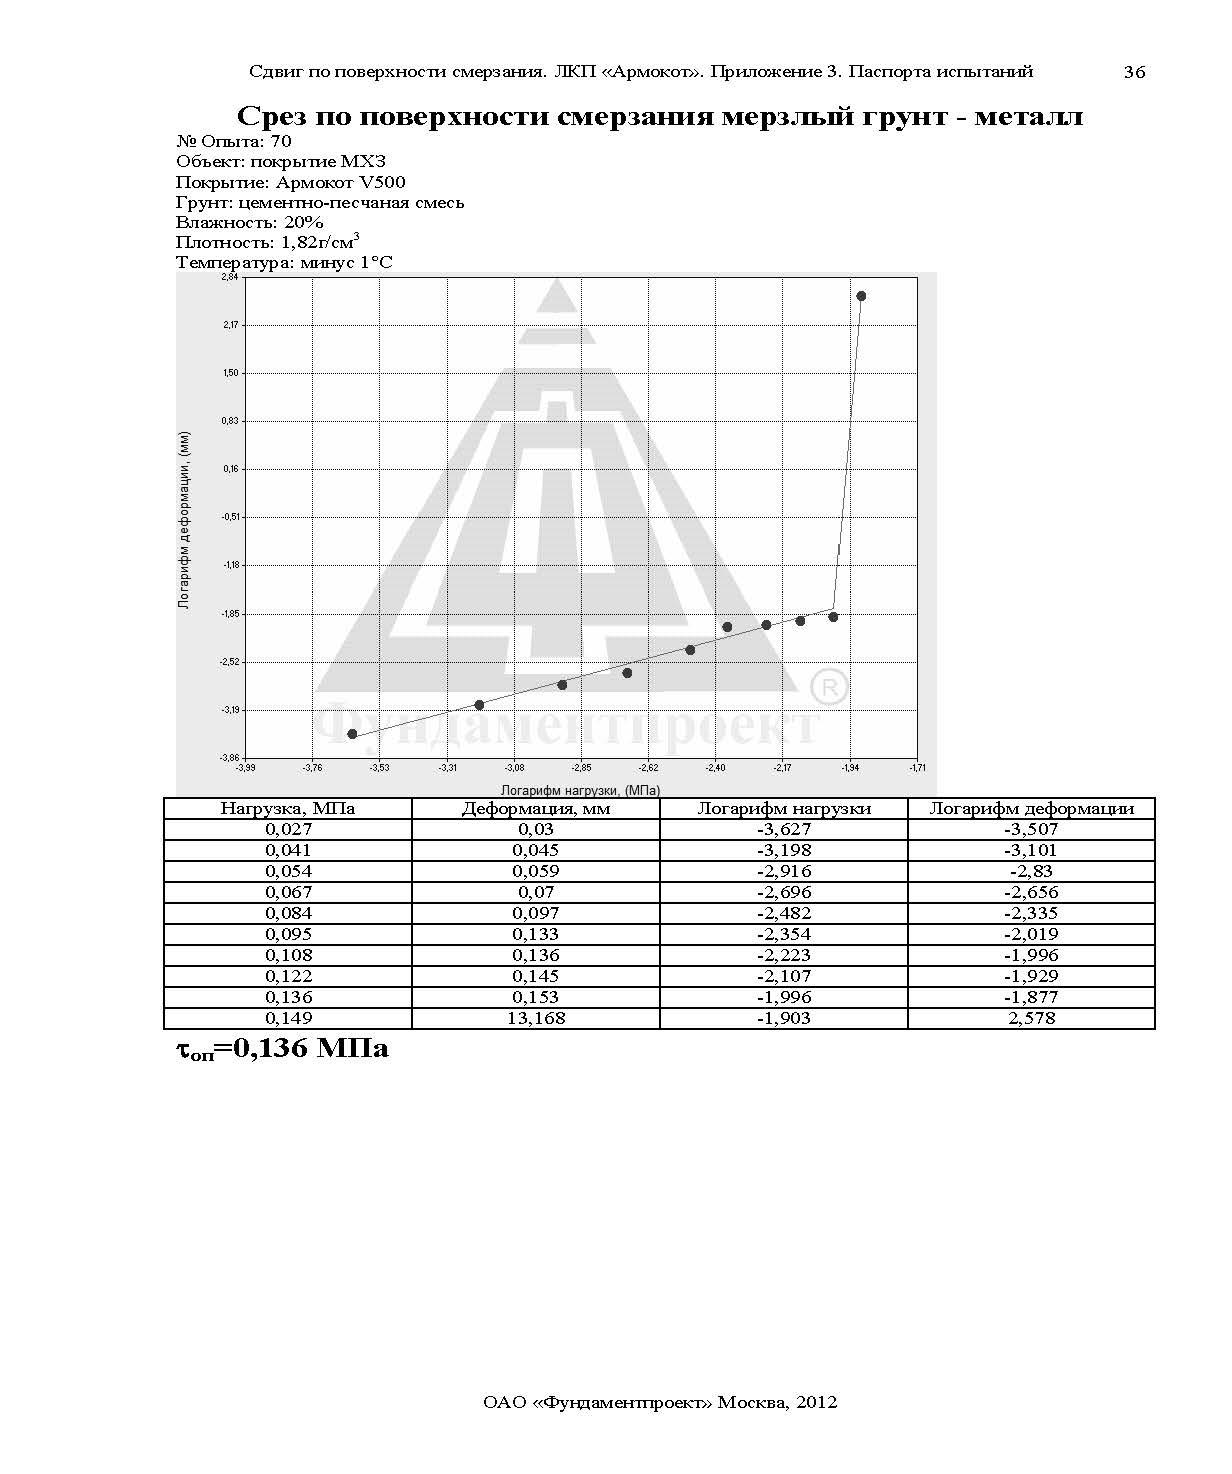 Отчет по сваям Армокот V500 Фундаментпроект_Страница_61